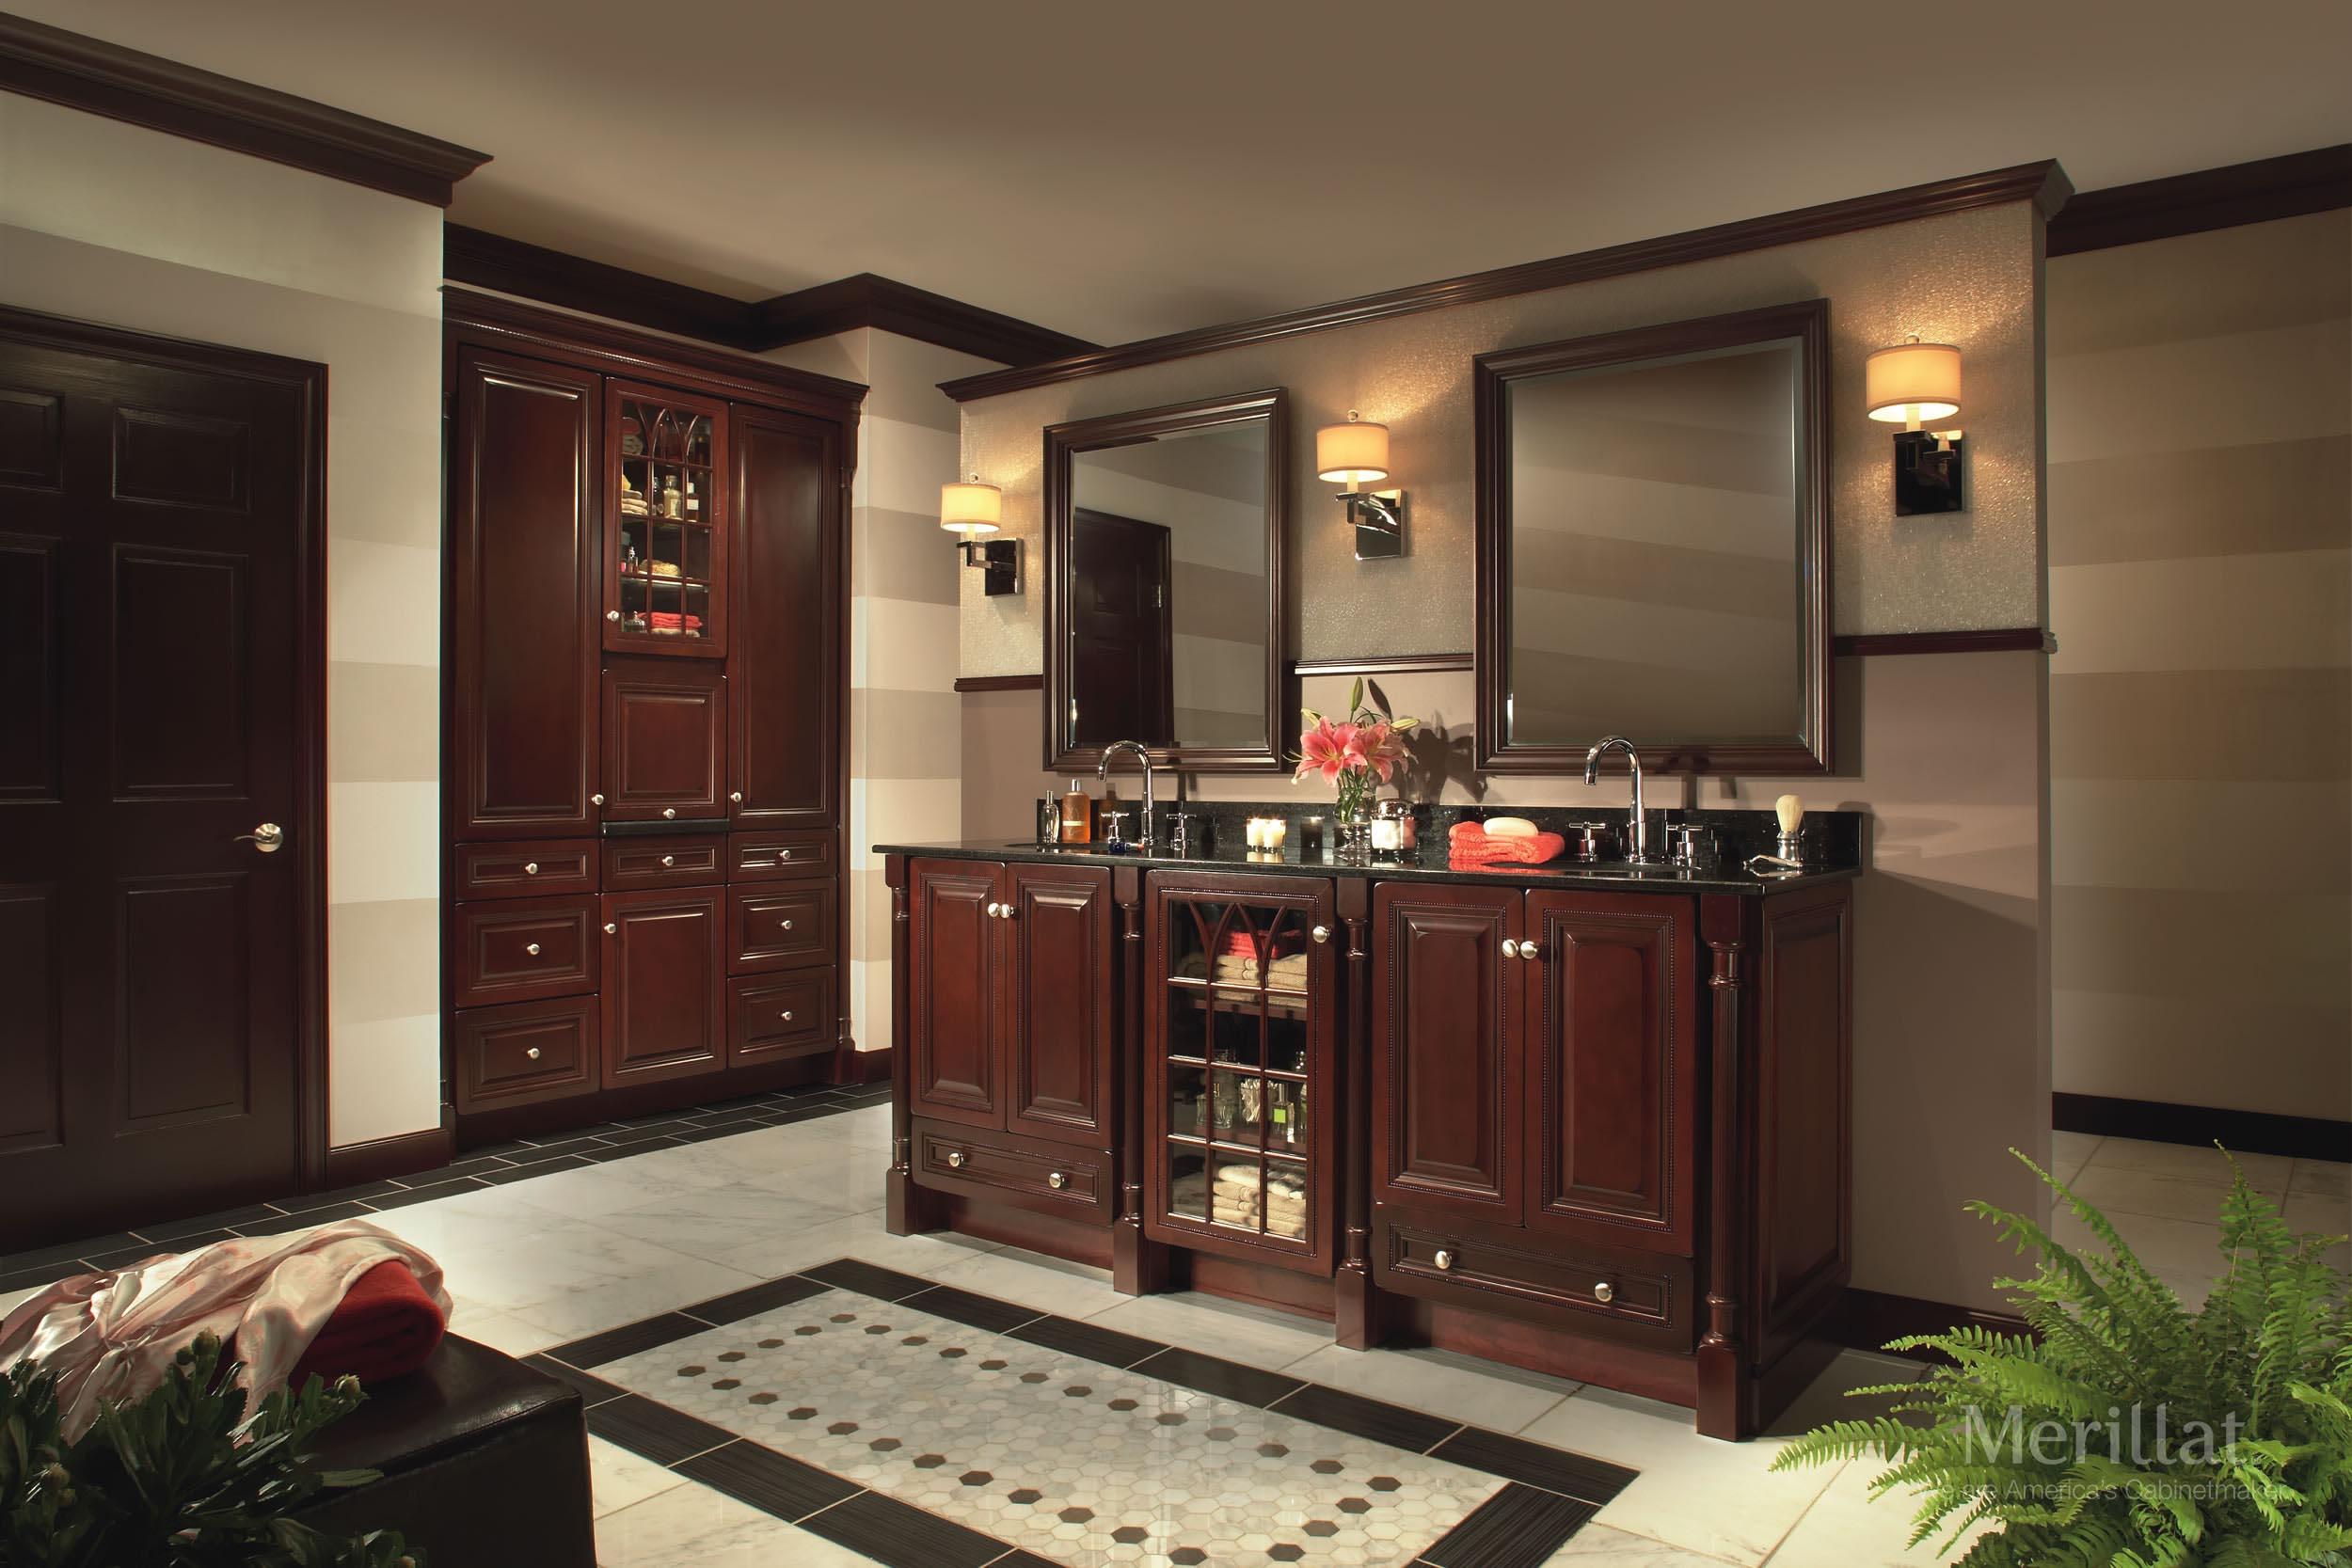 Merillat bathroom vanity - Merillat Bathroom Vanity 27